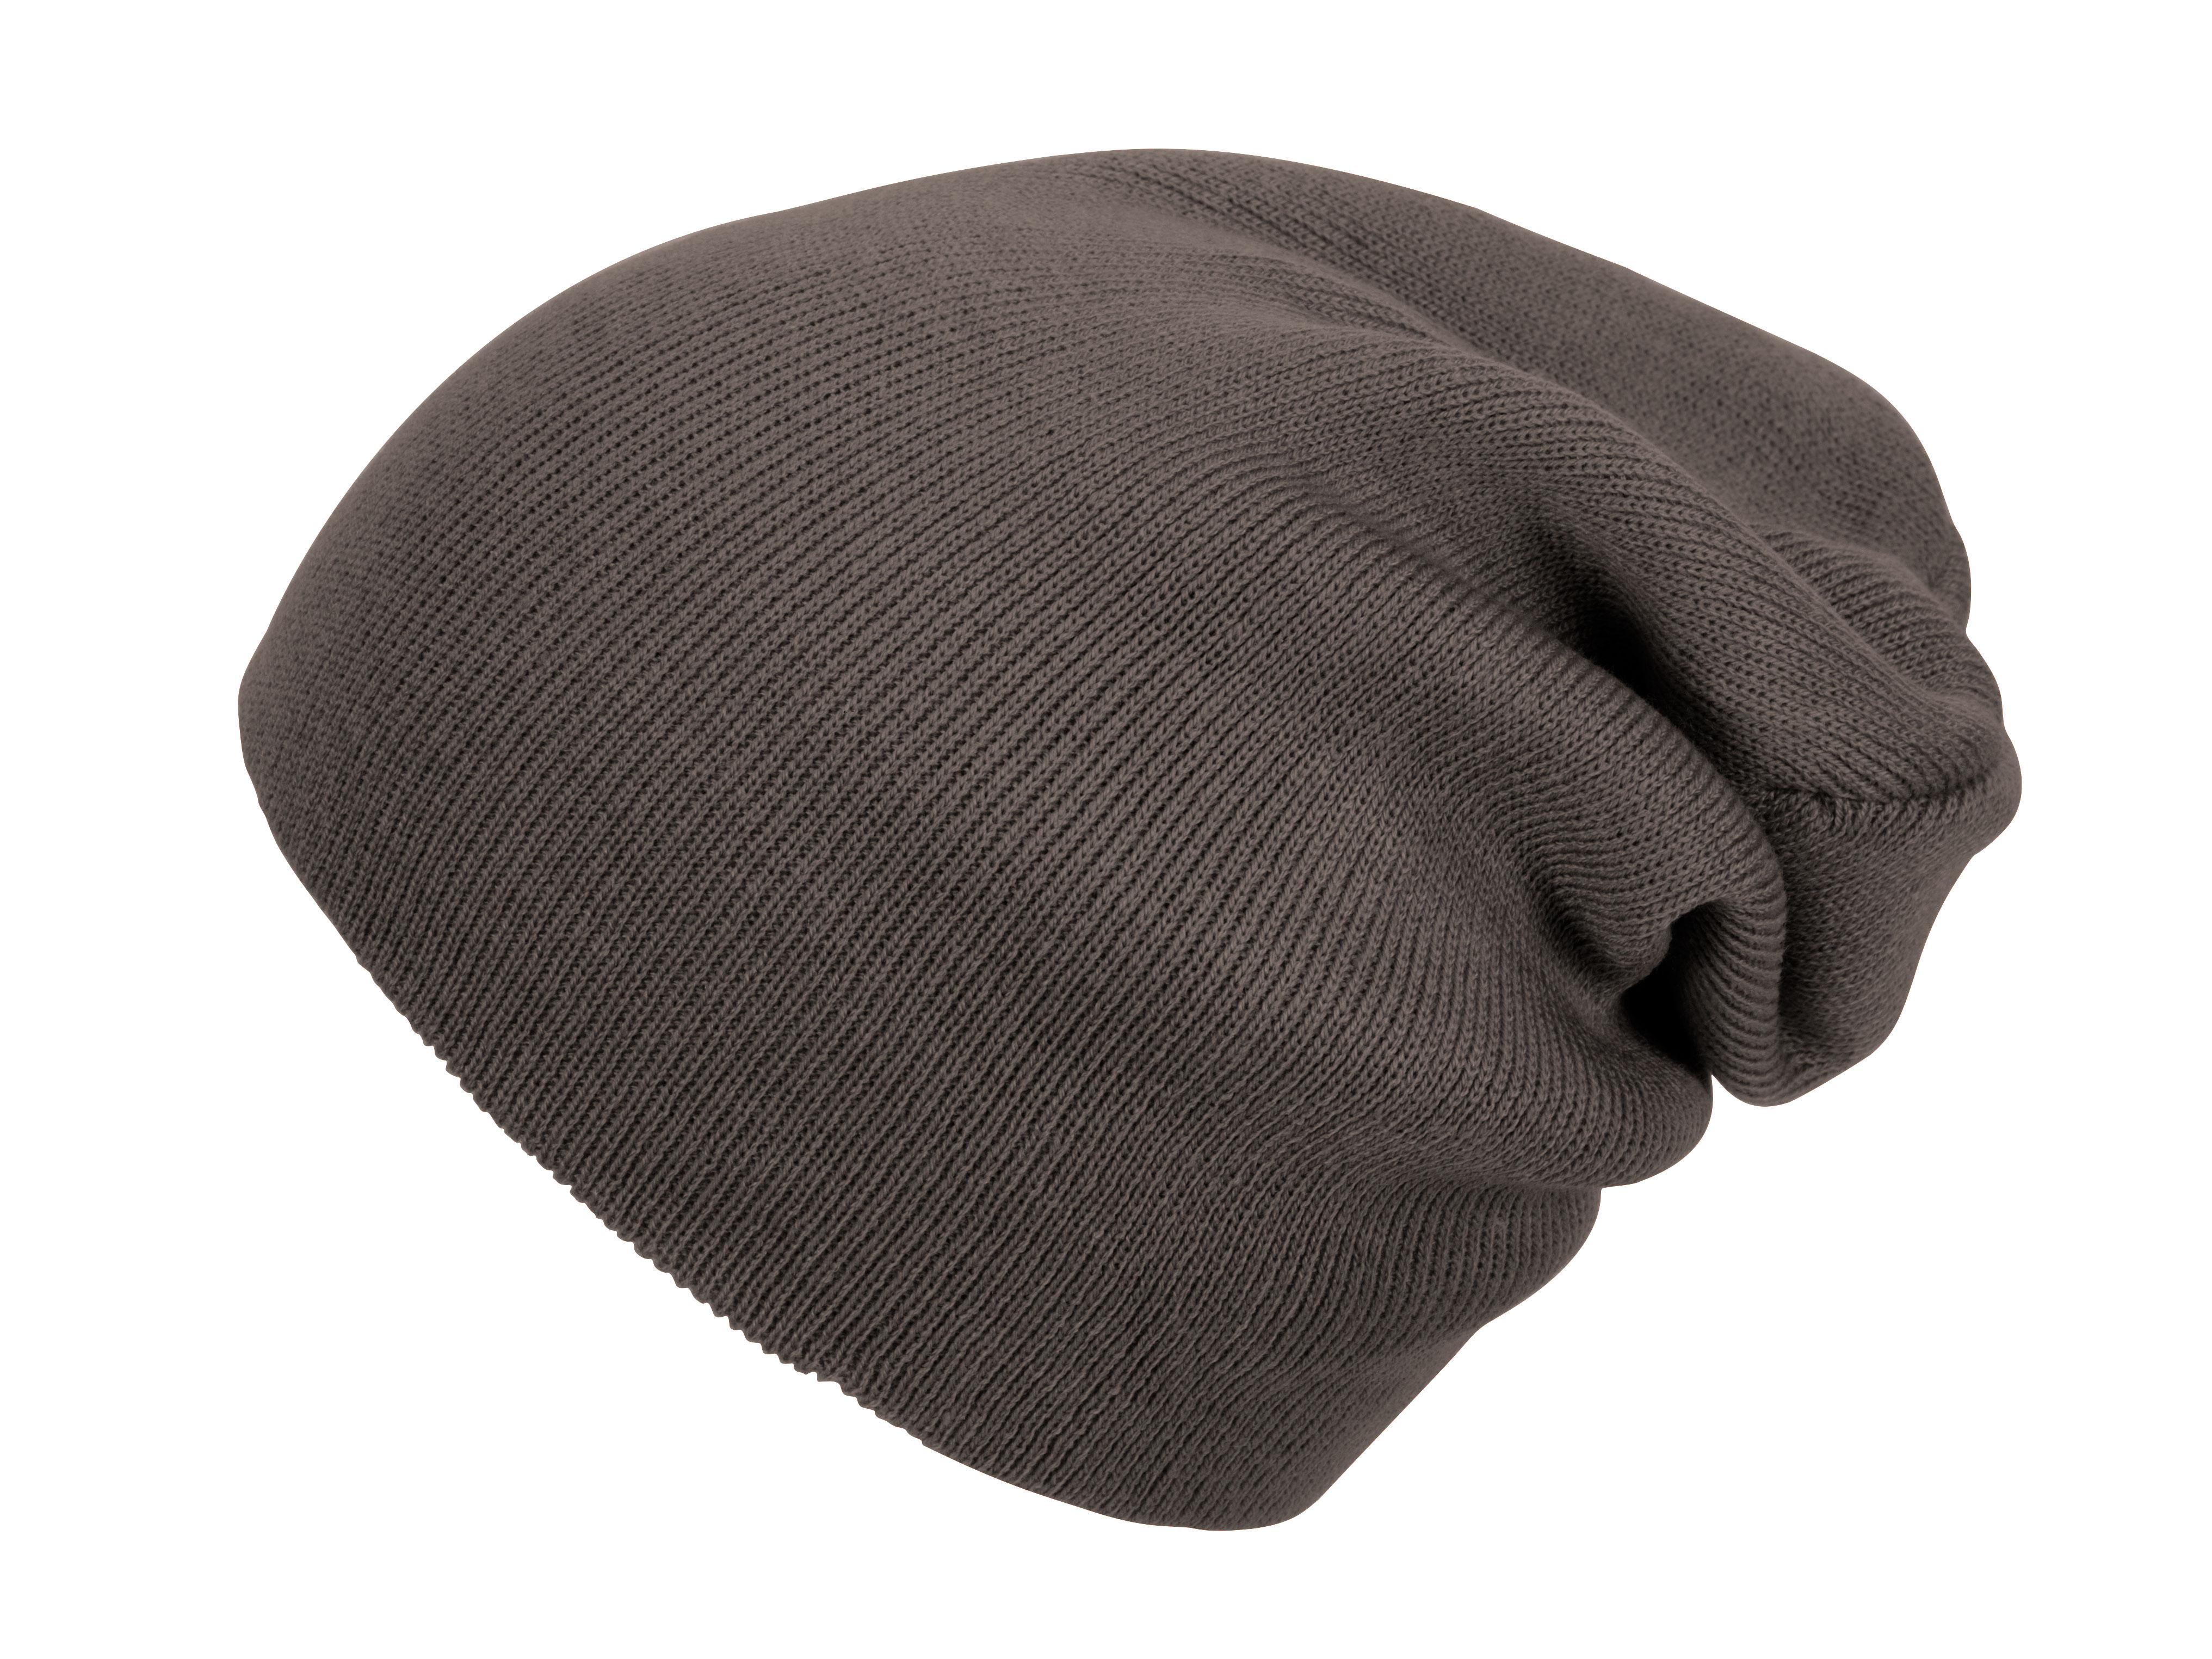 thumbnail 20 - Top Headwear Solid Winter Long Beanie - 12 Piece Wholesale